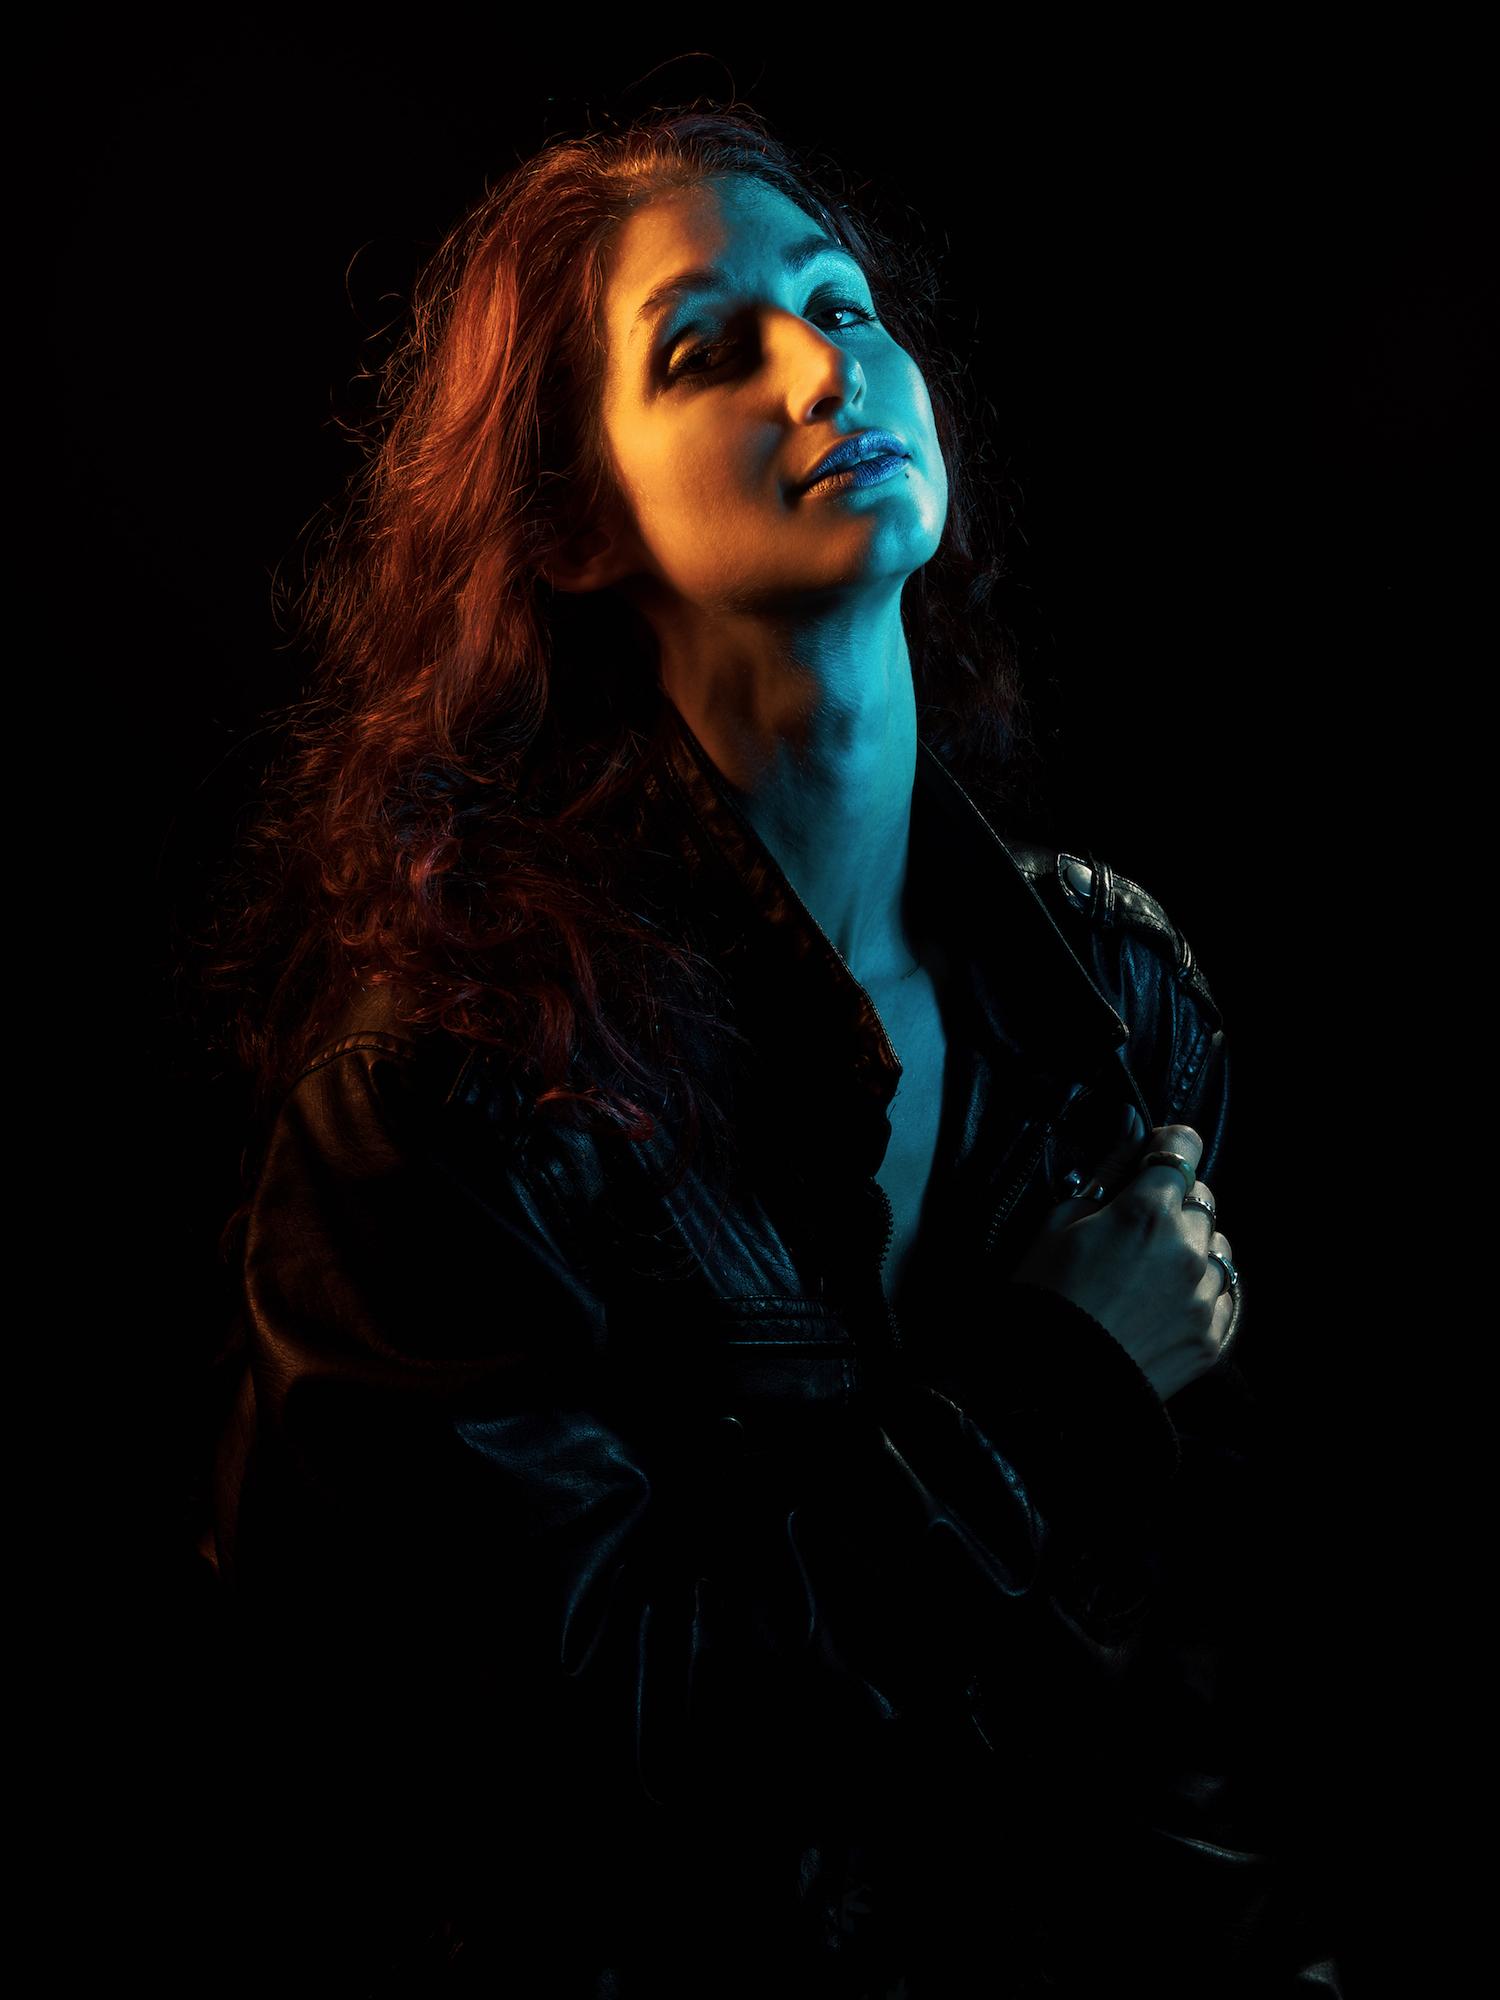 "Geena Matuson (@geenamatuson) ""The Girl Mirage"" modeling for J.T. Armstrong of Run N Gun Photo, 2018. See more @ youtube.com/c/RunNGunPhoto."